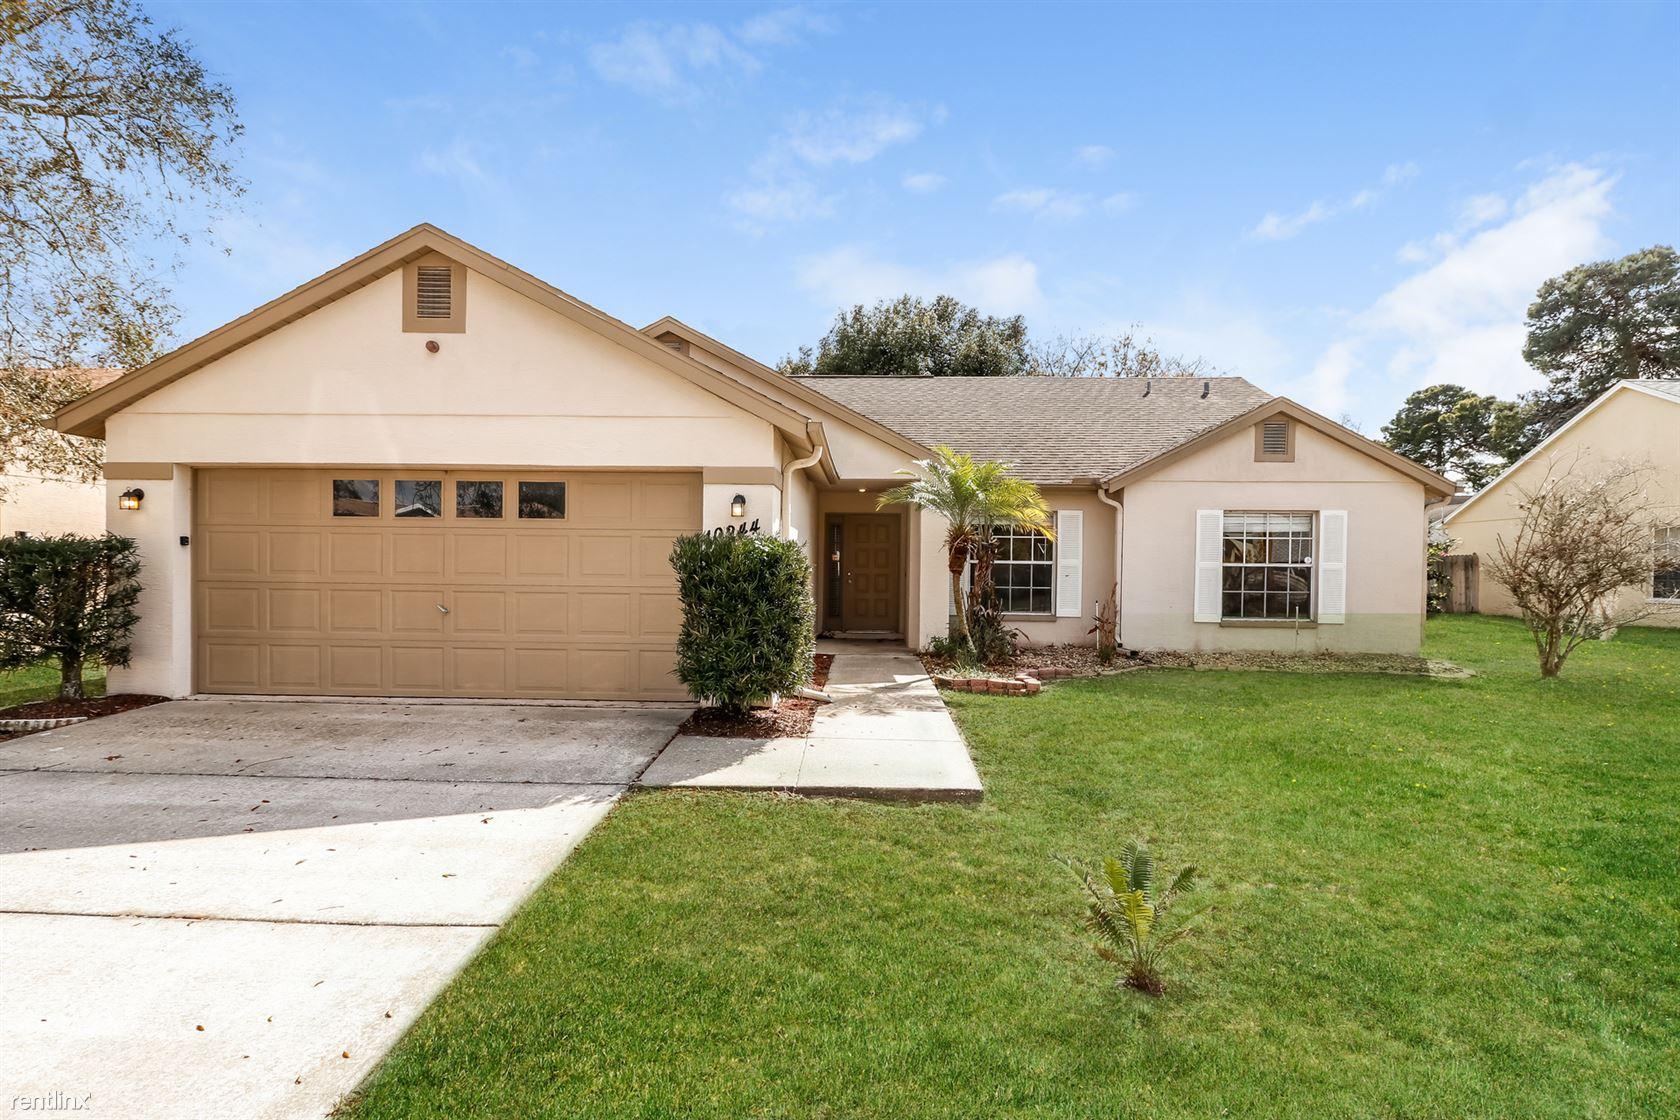 10244 Rainbow Oaks Dr, Hudson, FL - $1,399